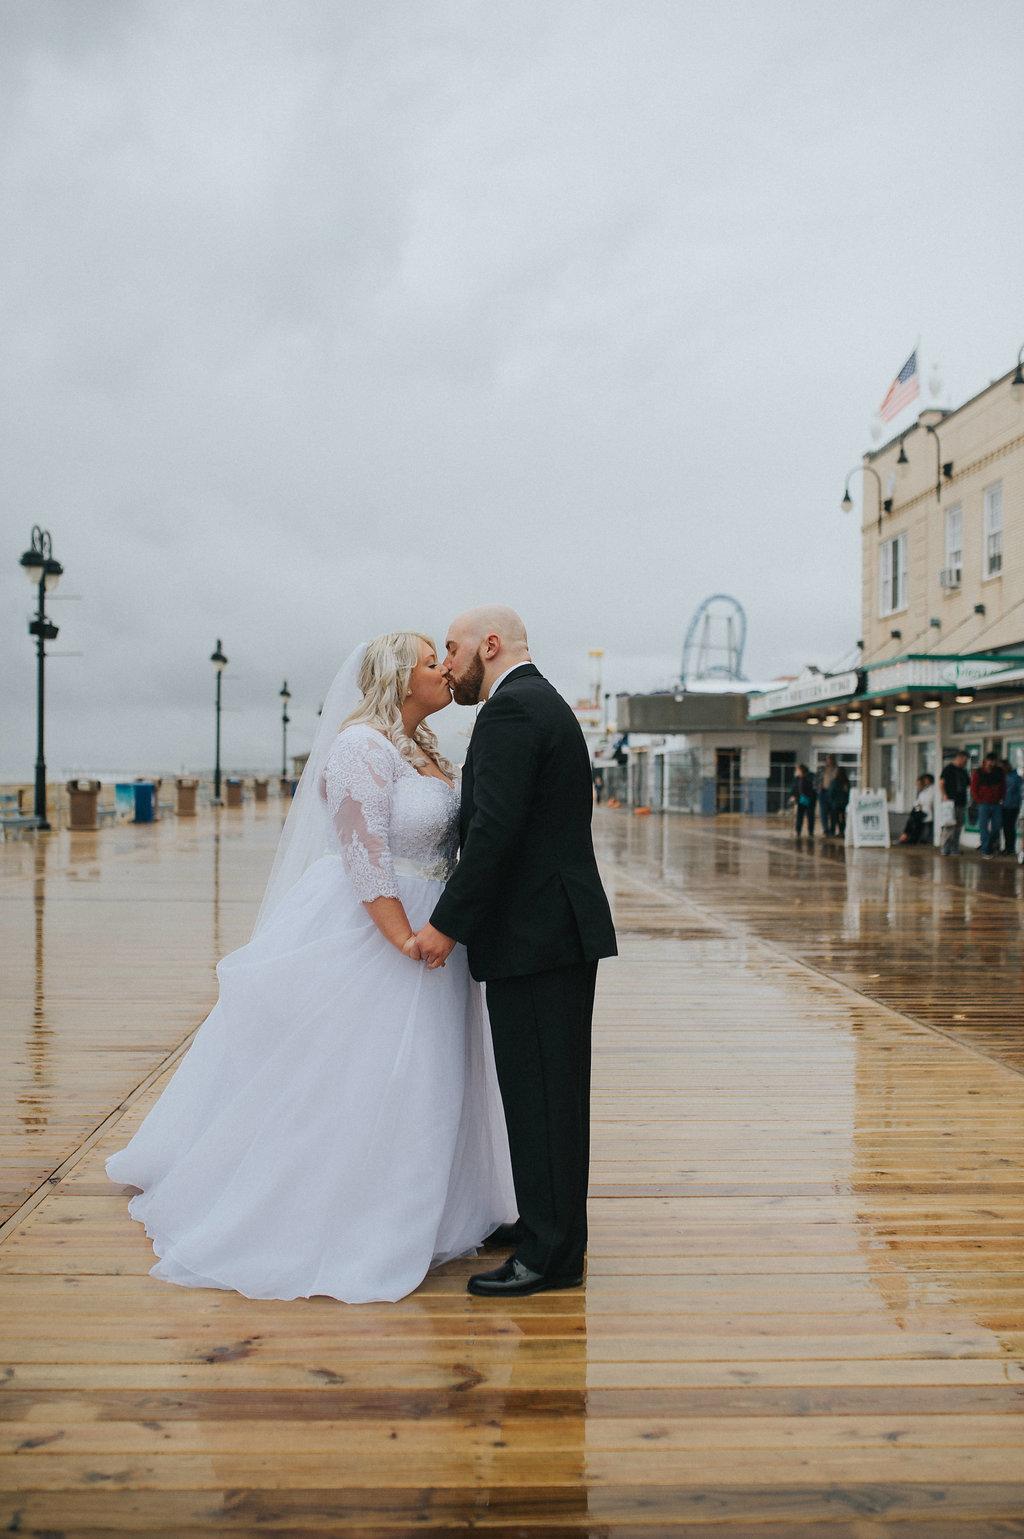 Morgan-and-Cory-Ocean-City-Wedding-144.jpg